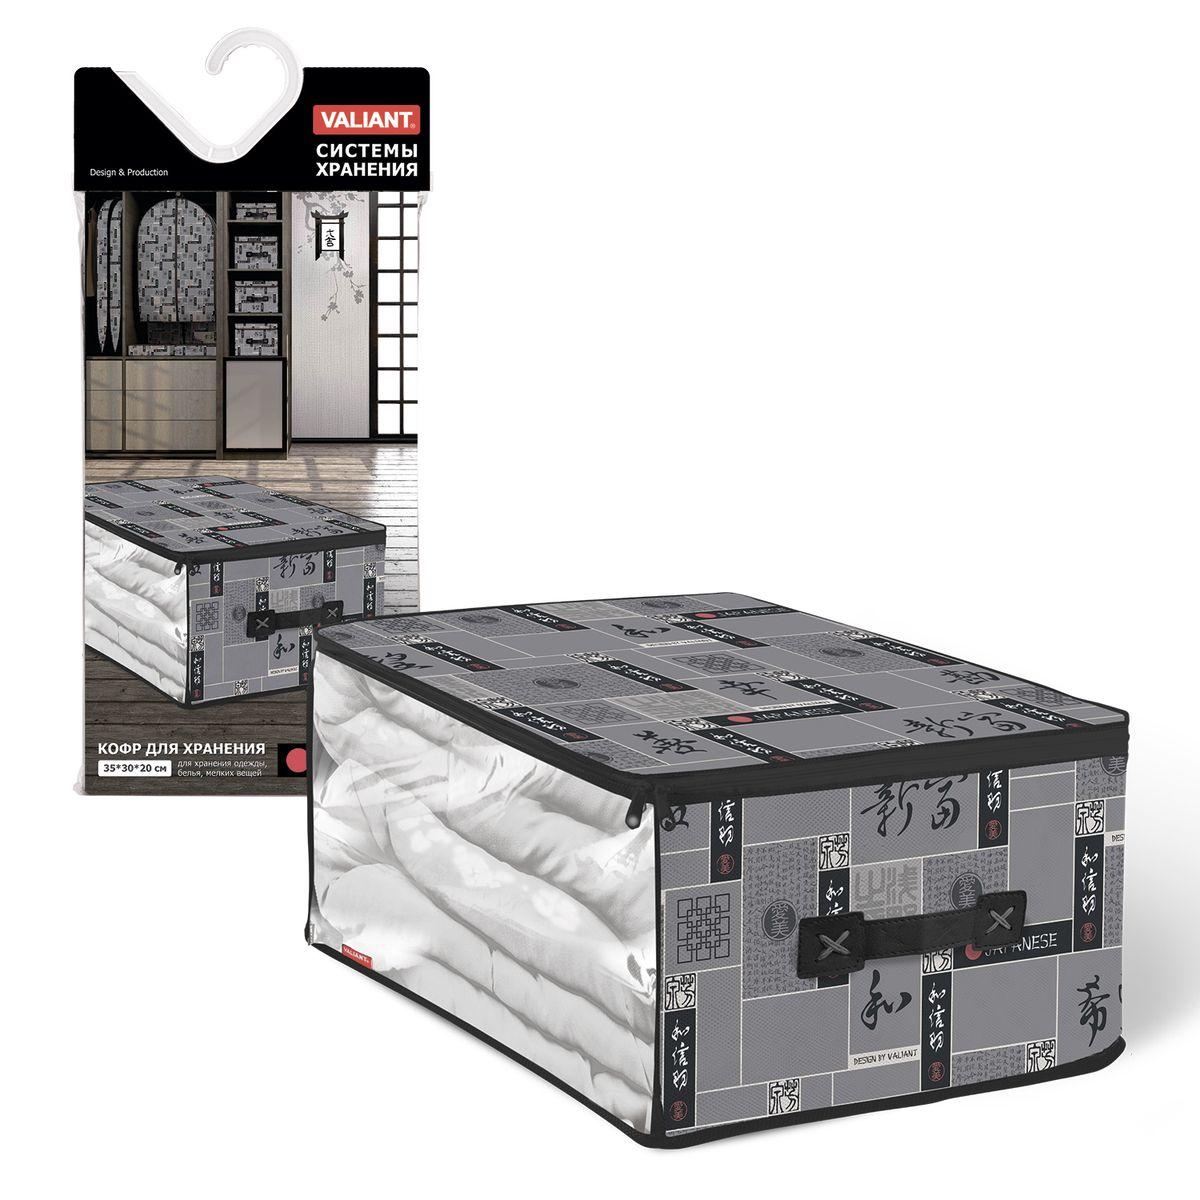 Кофр для хранения Valiant Japanese Black, 35 х 30 х 20 см кофр для хранения valiant romantic 60 х 50 х 35 см